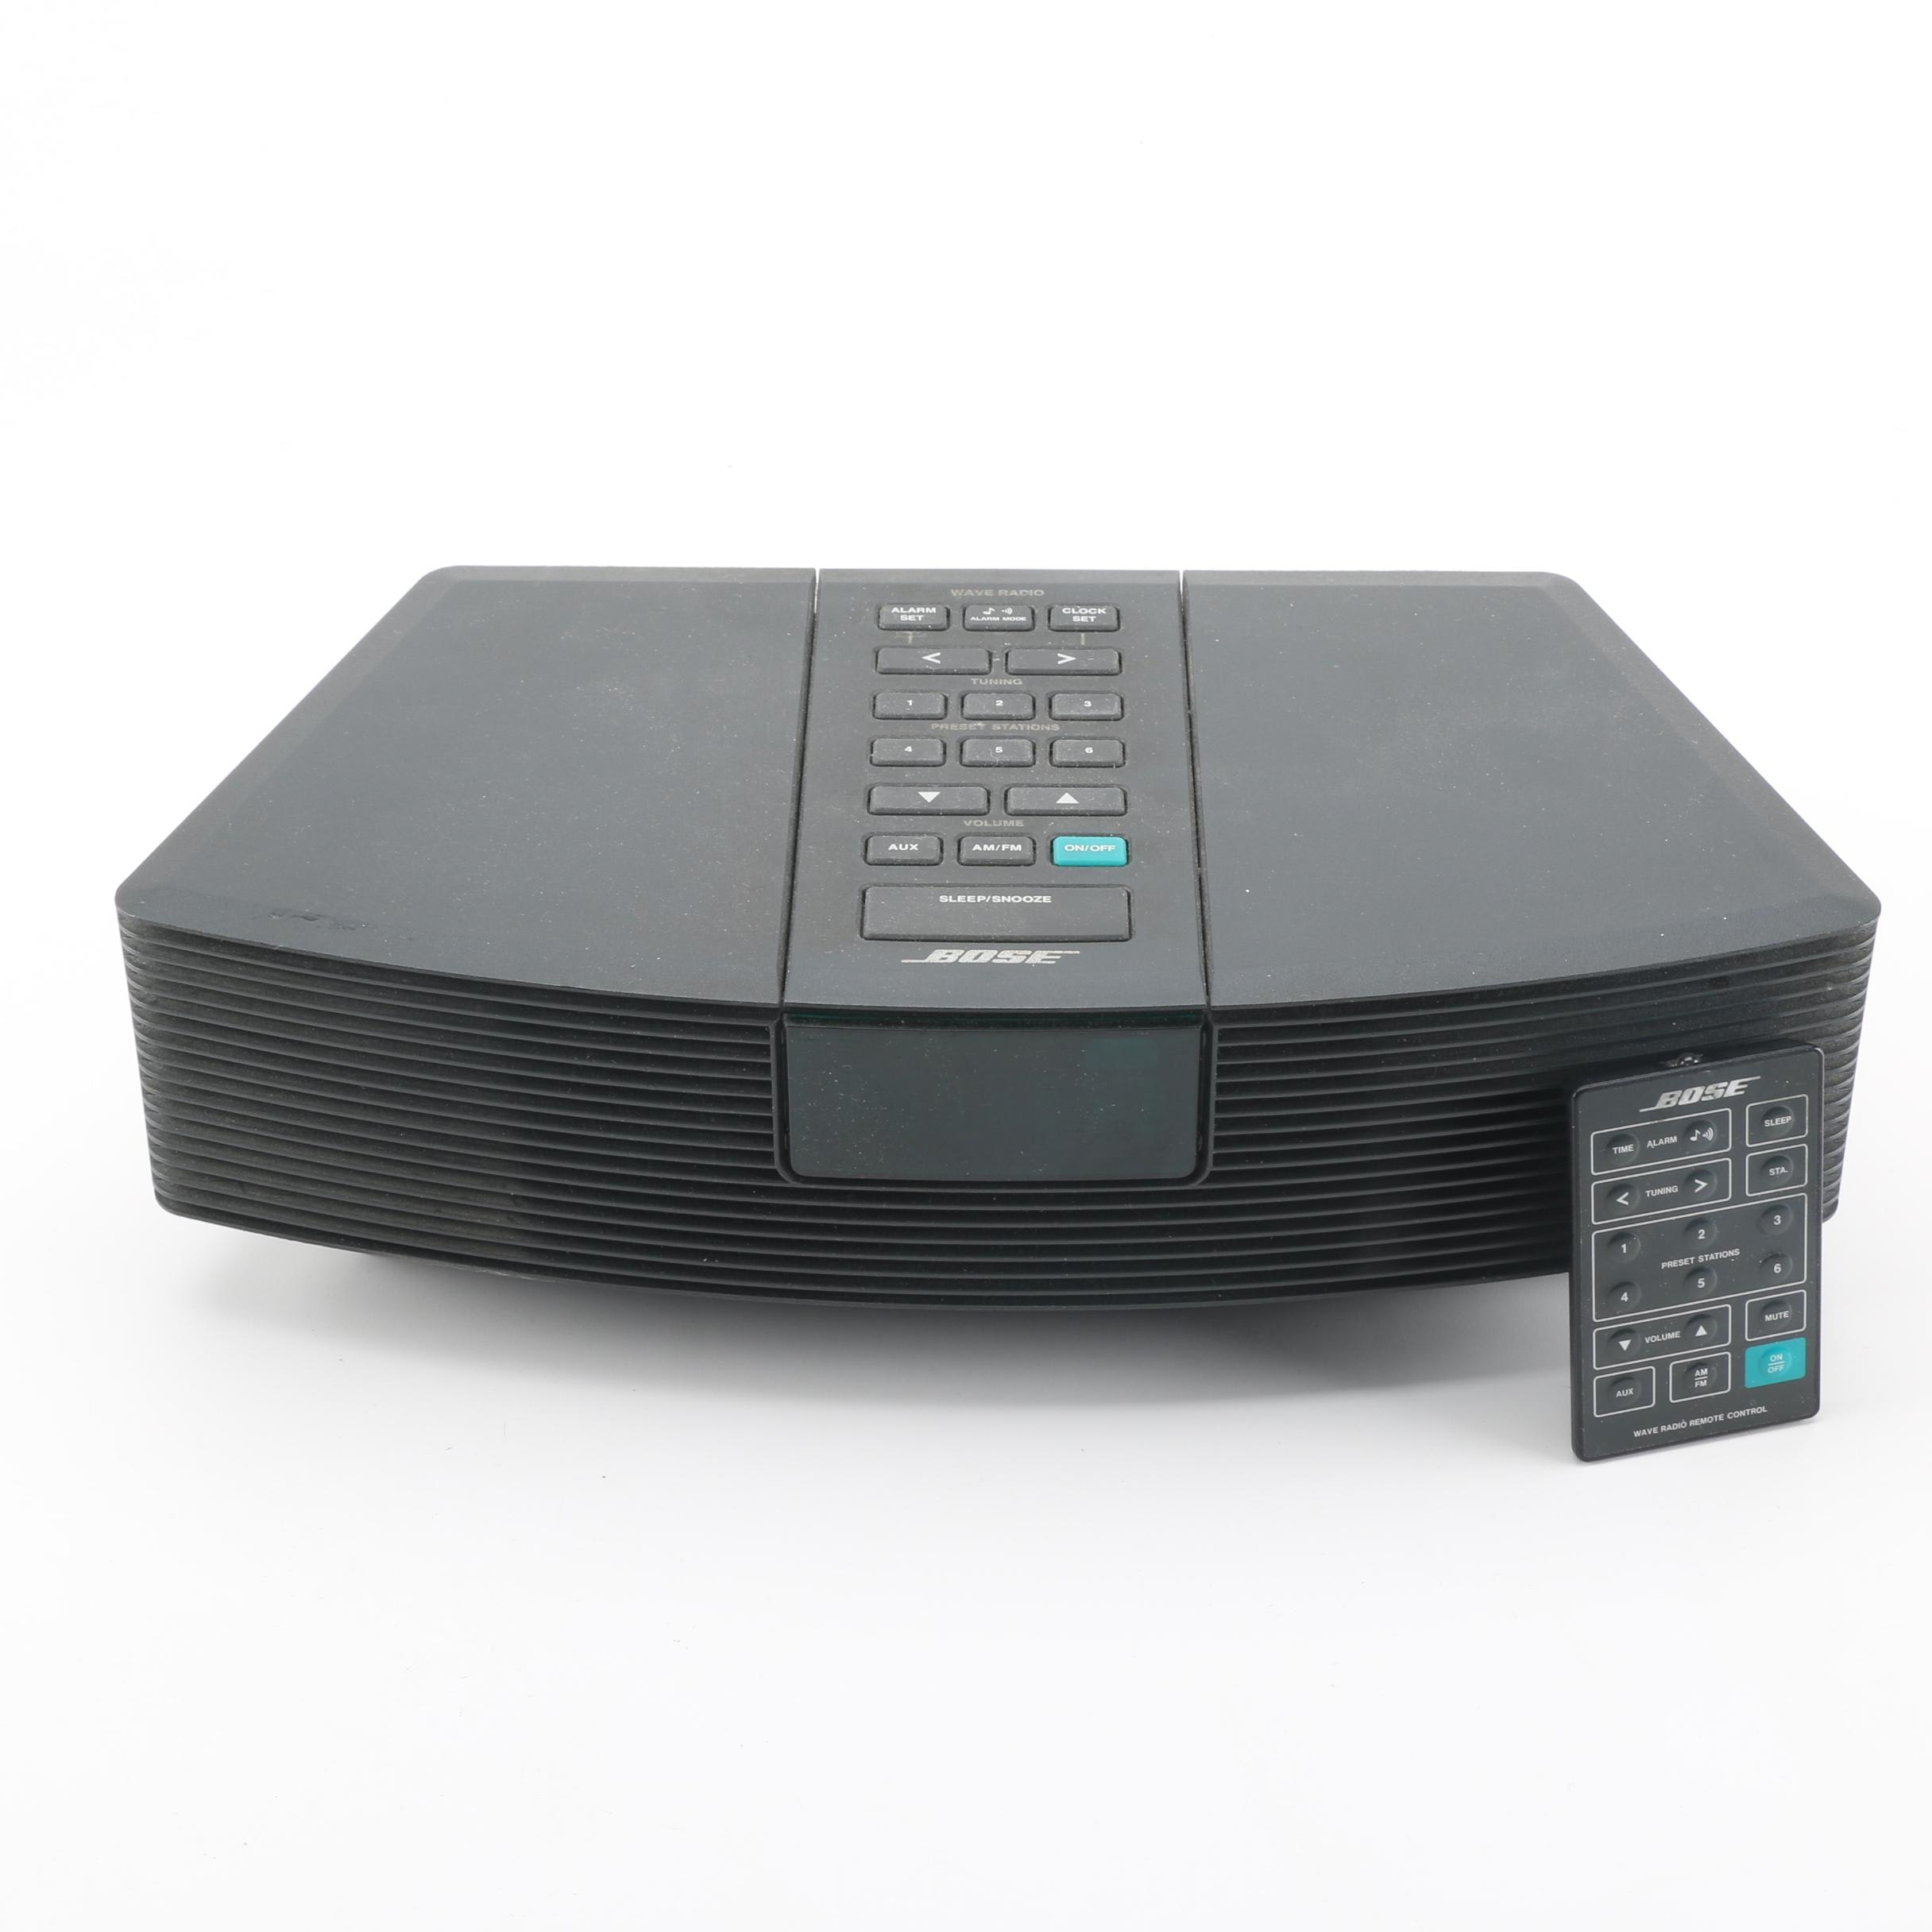 Bose Wave Alarm Clock Radio